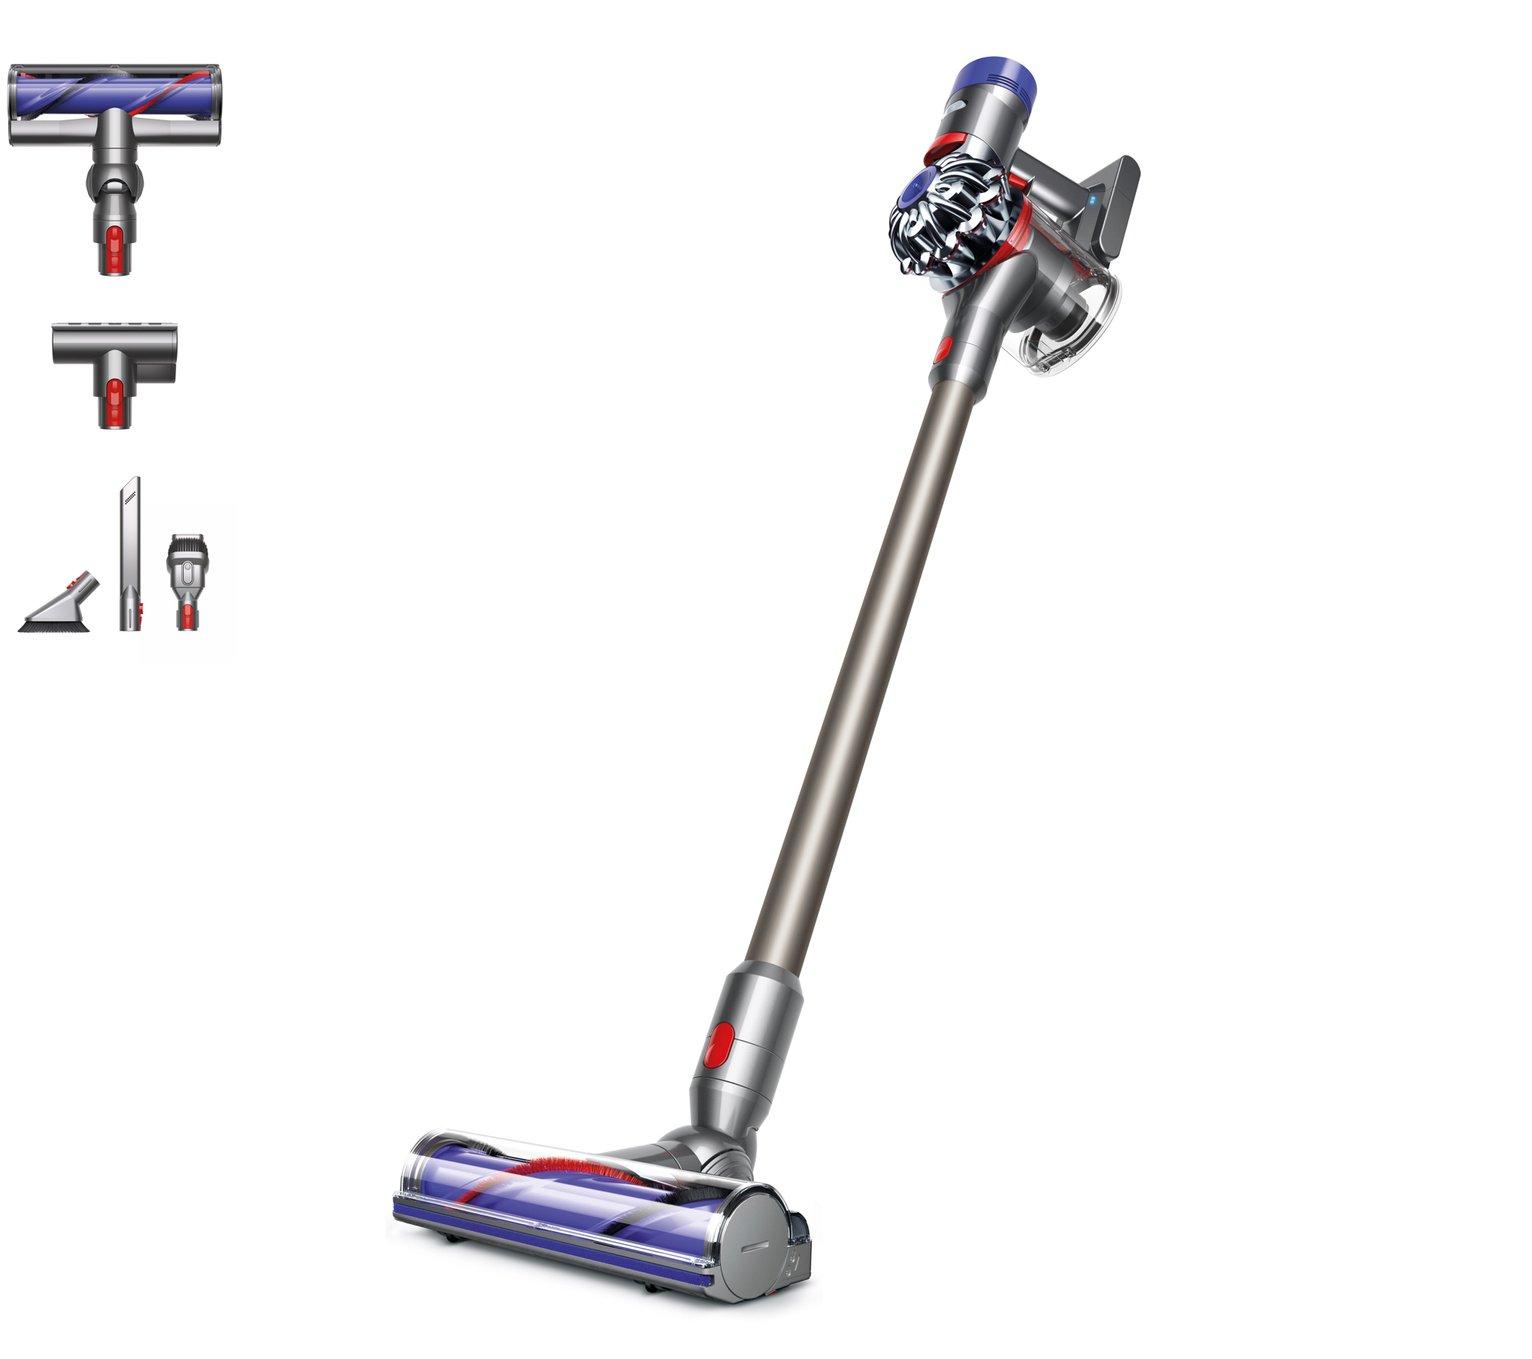 Ean 5025155024287 Dyson V8 Animal Cordless Vacuum